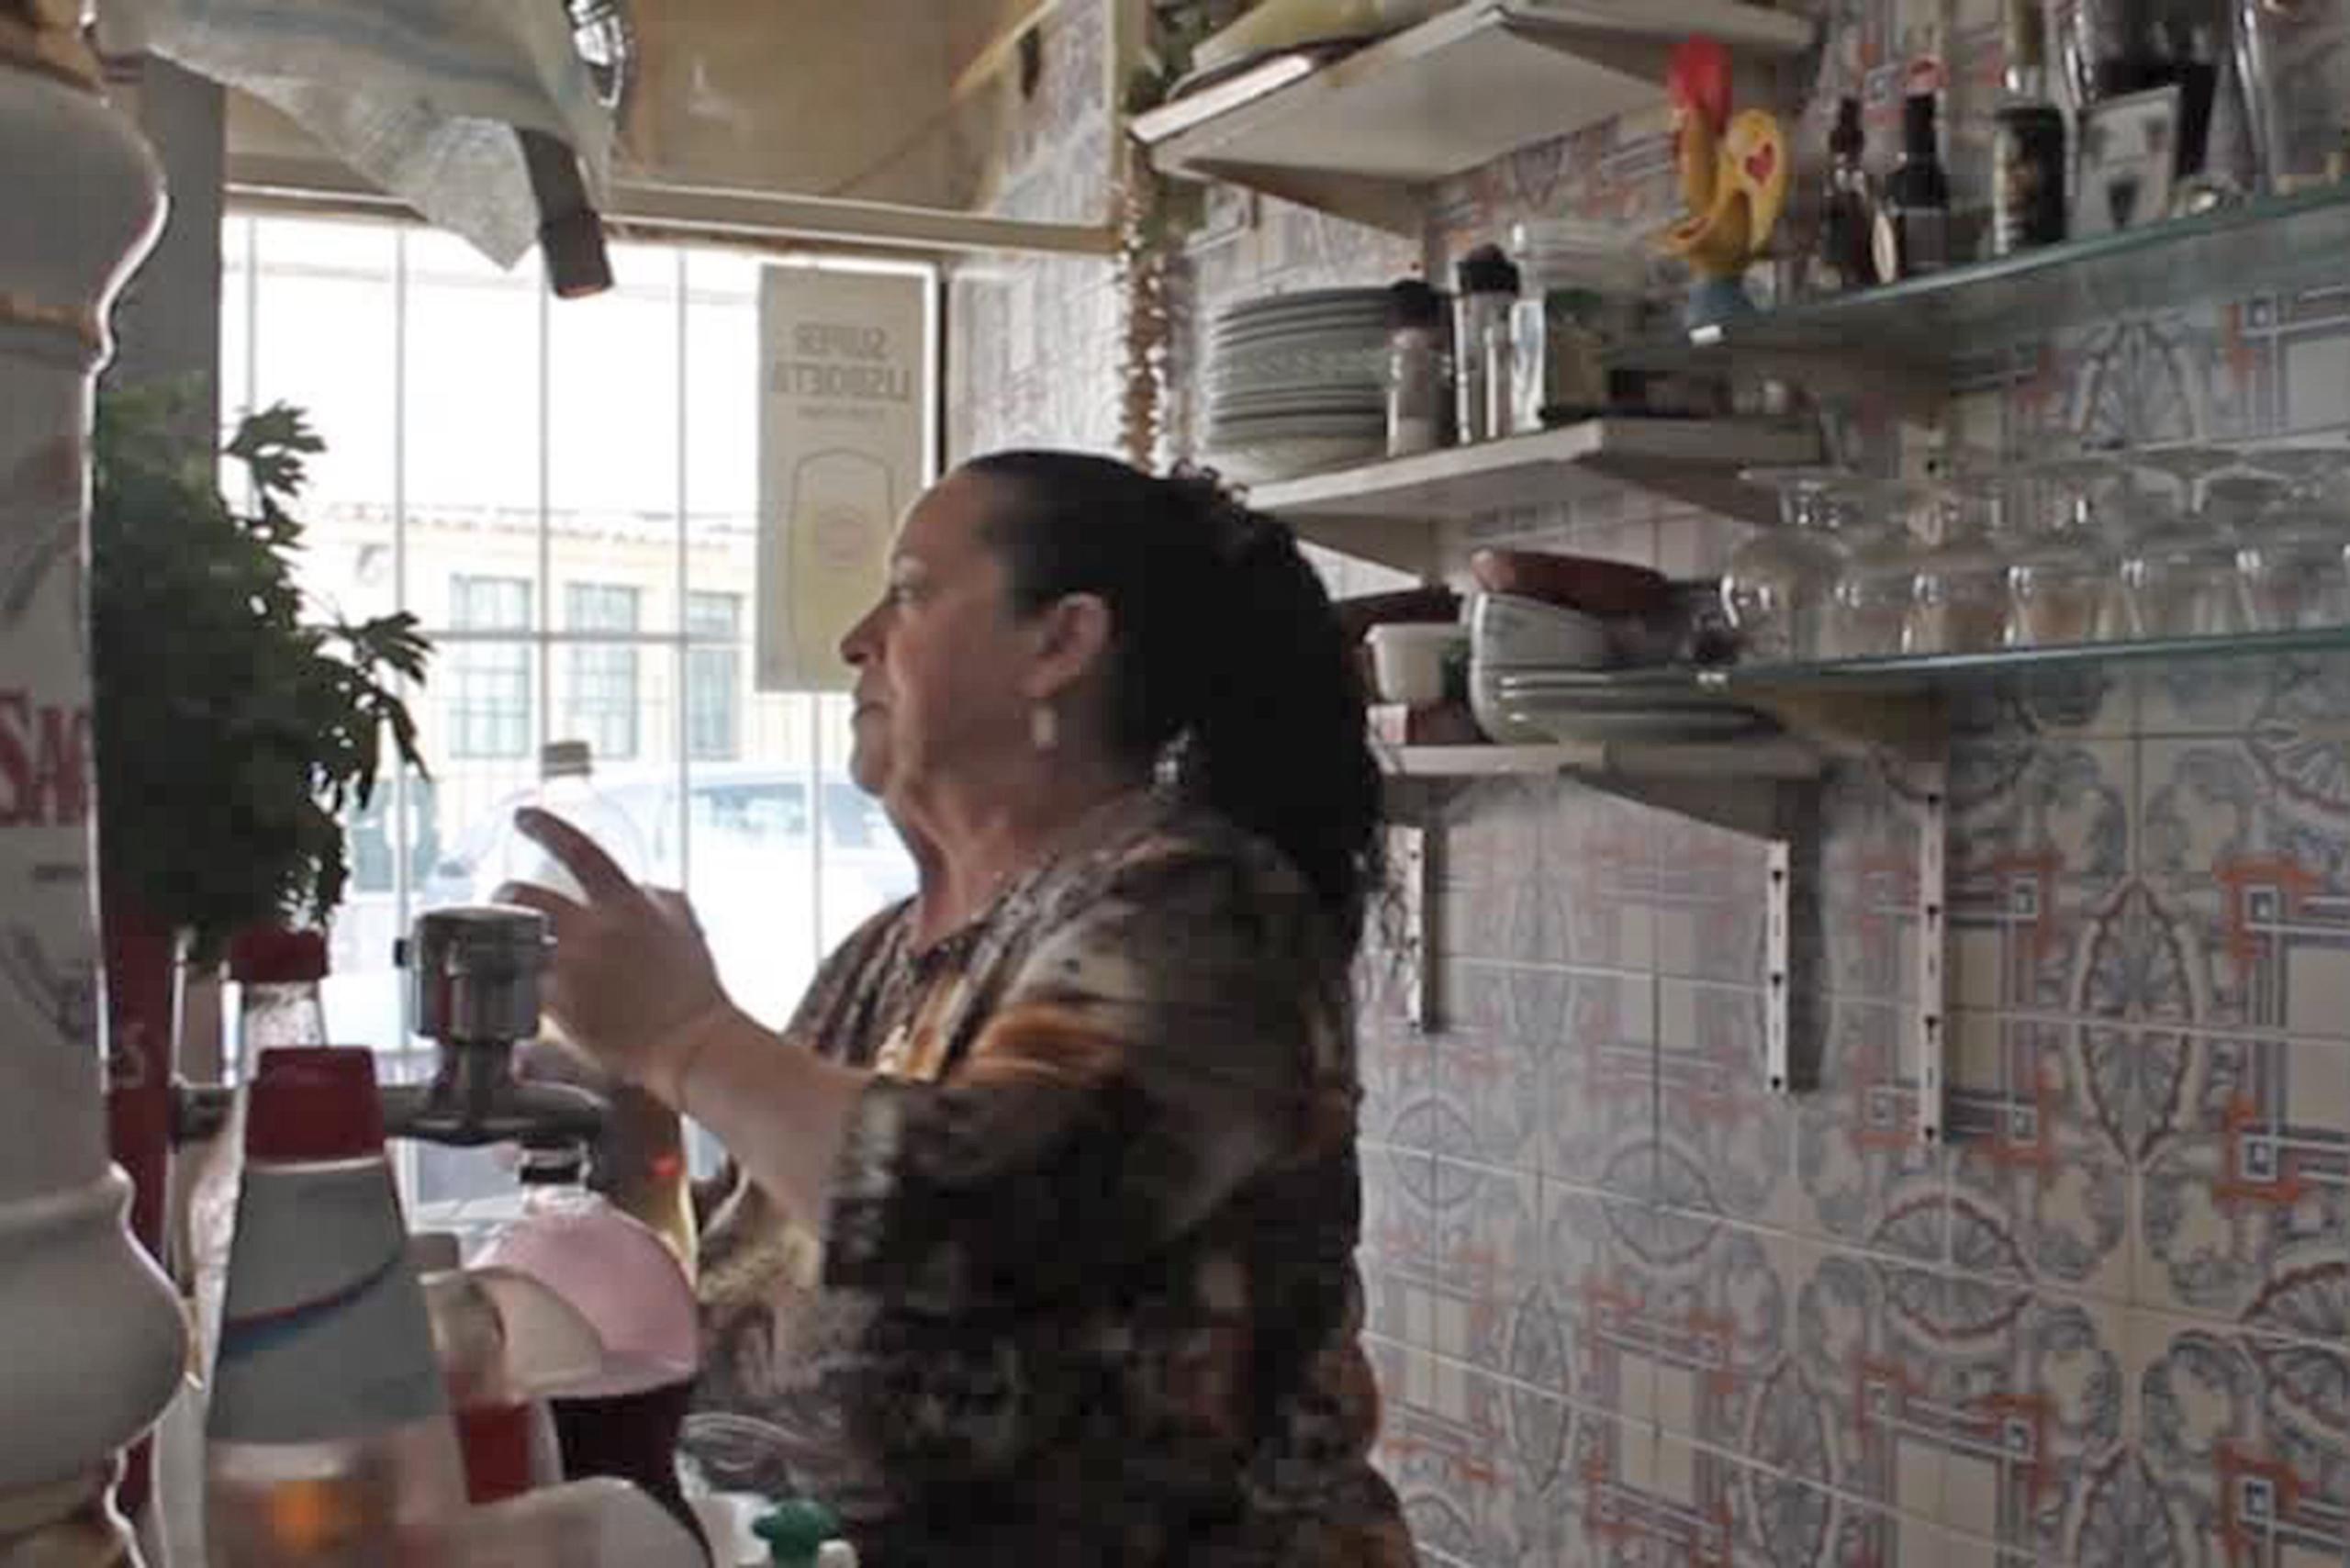 Clandestino – Clara, Pepe, Luisa, Sebastiao | Film still: Clara Walter